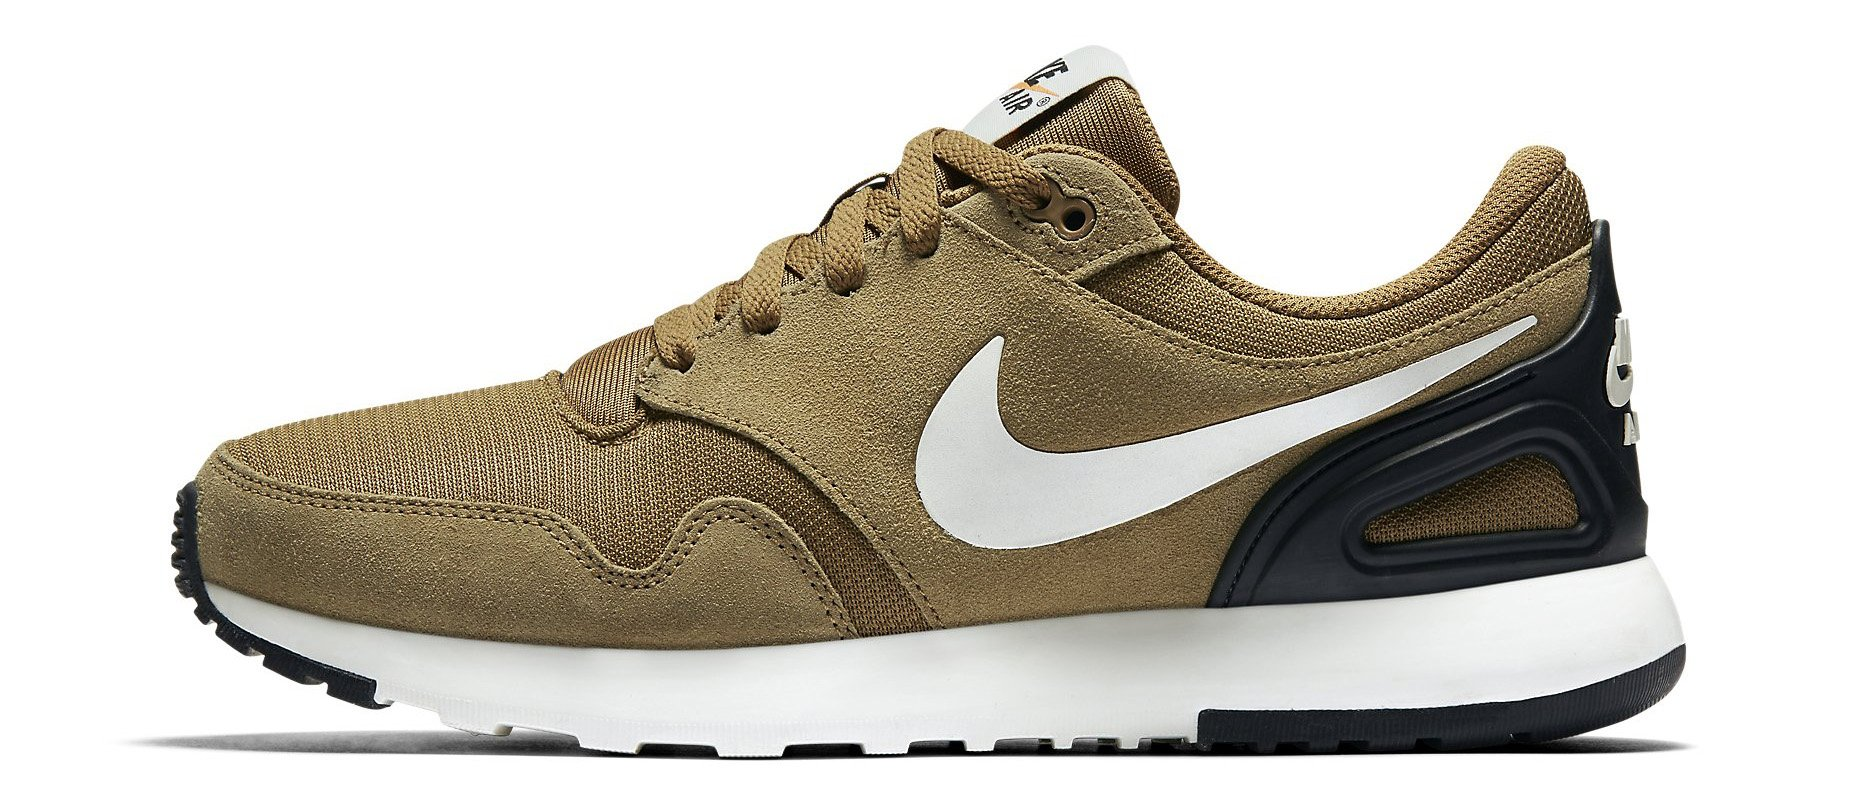 4eab574f7dd Pánská obuv Nike Air Vibenna